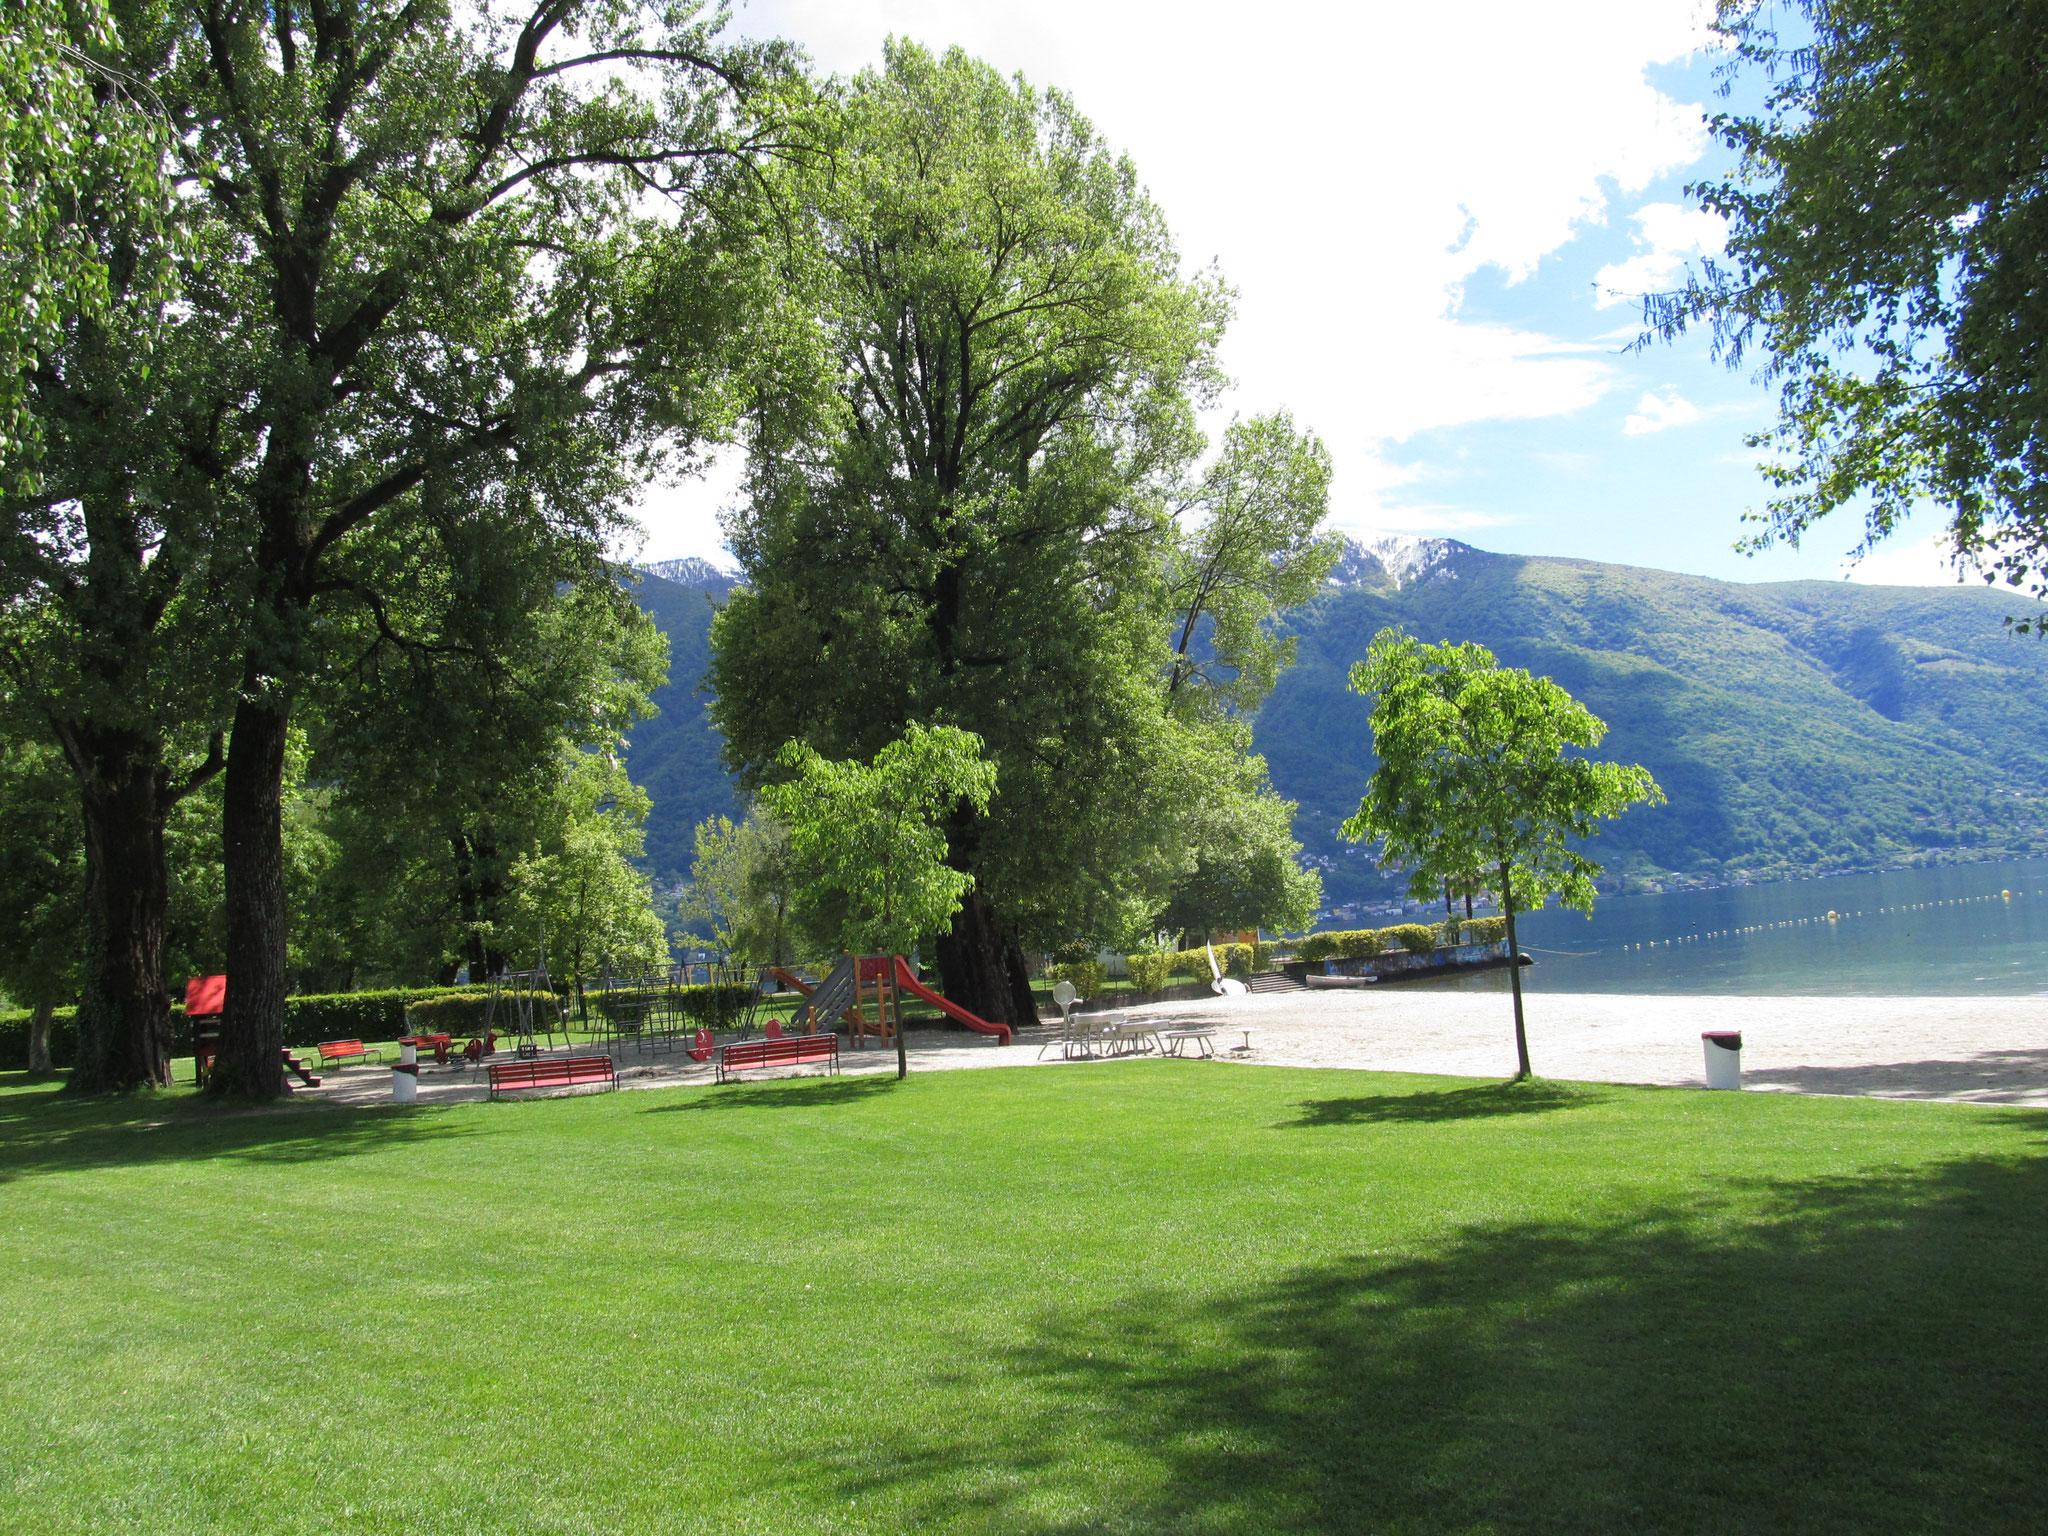 Bagno publicco in Ascona